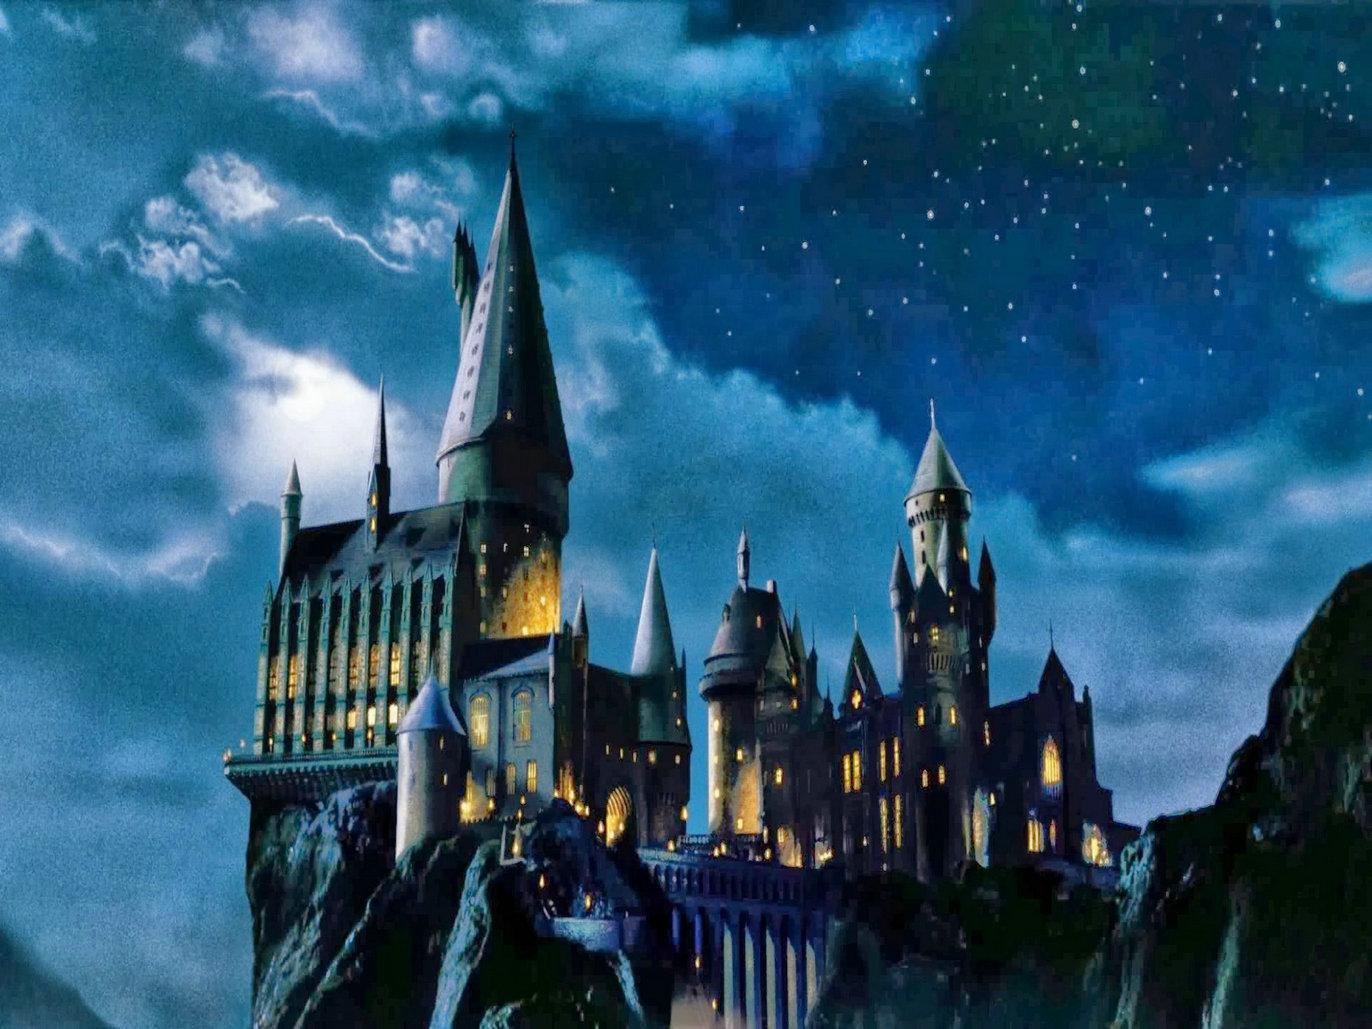 harry potter hogwarts castle night fantasy background high